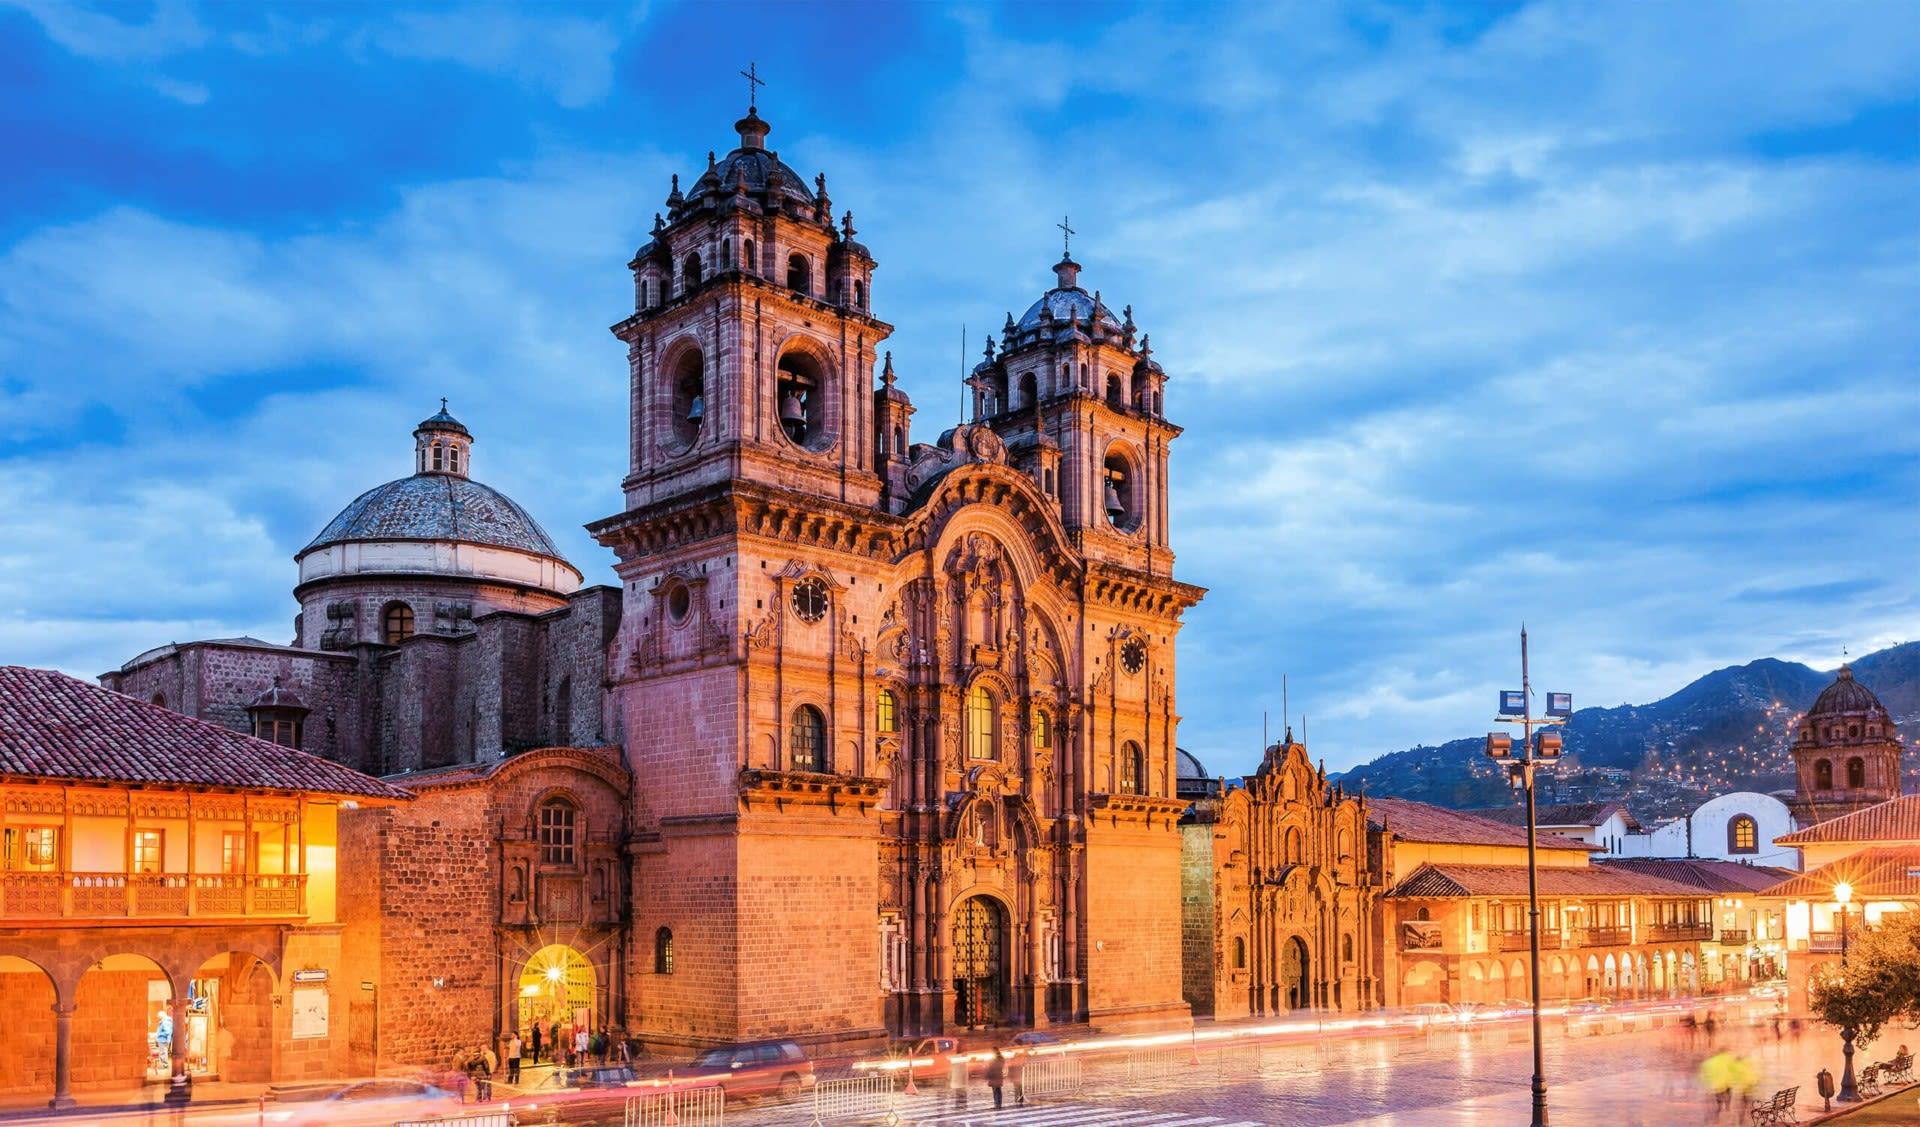 Peru cathedral at night